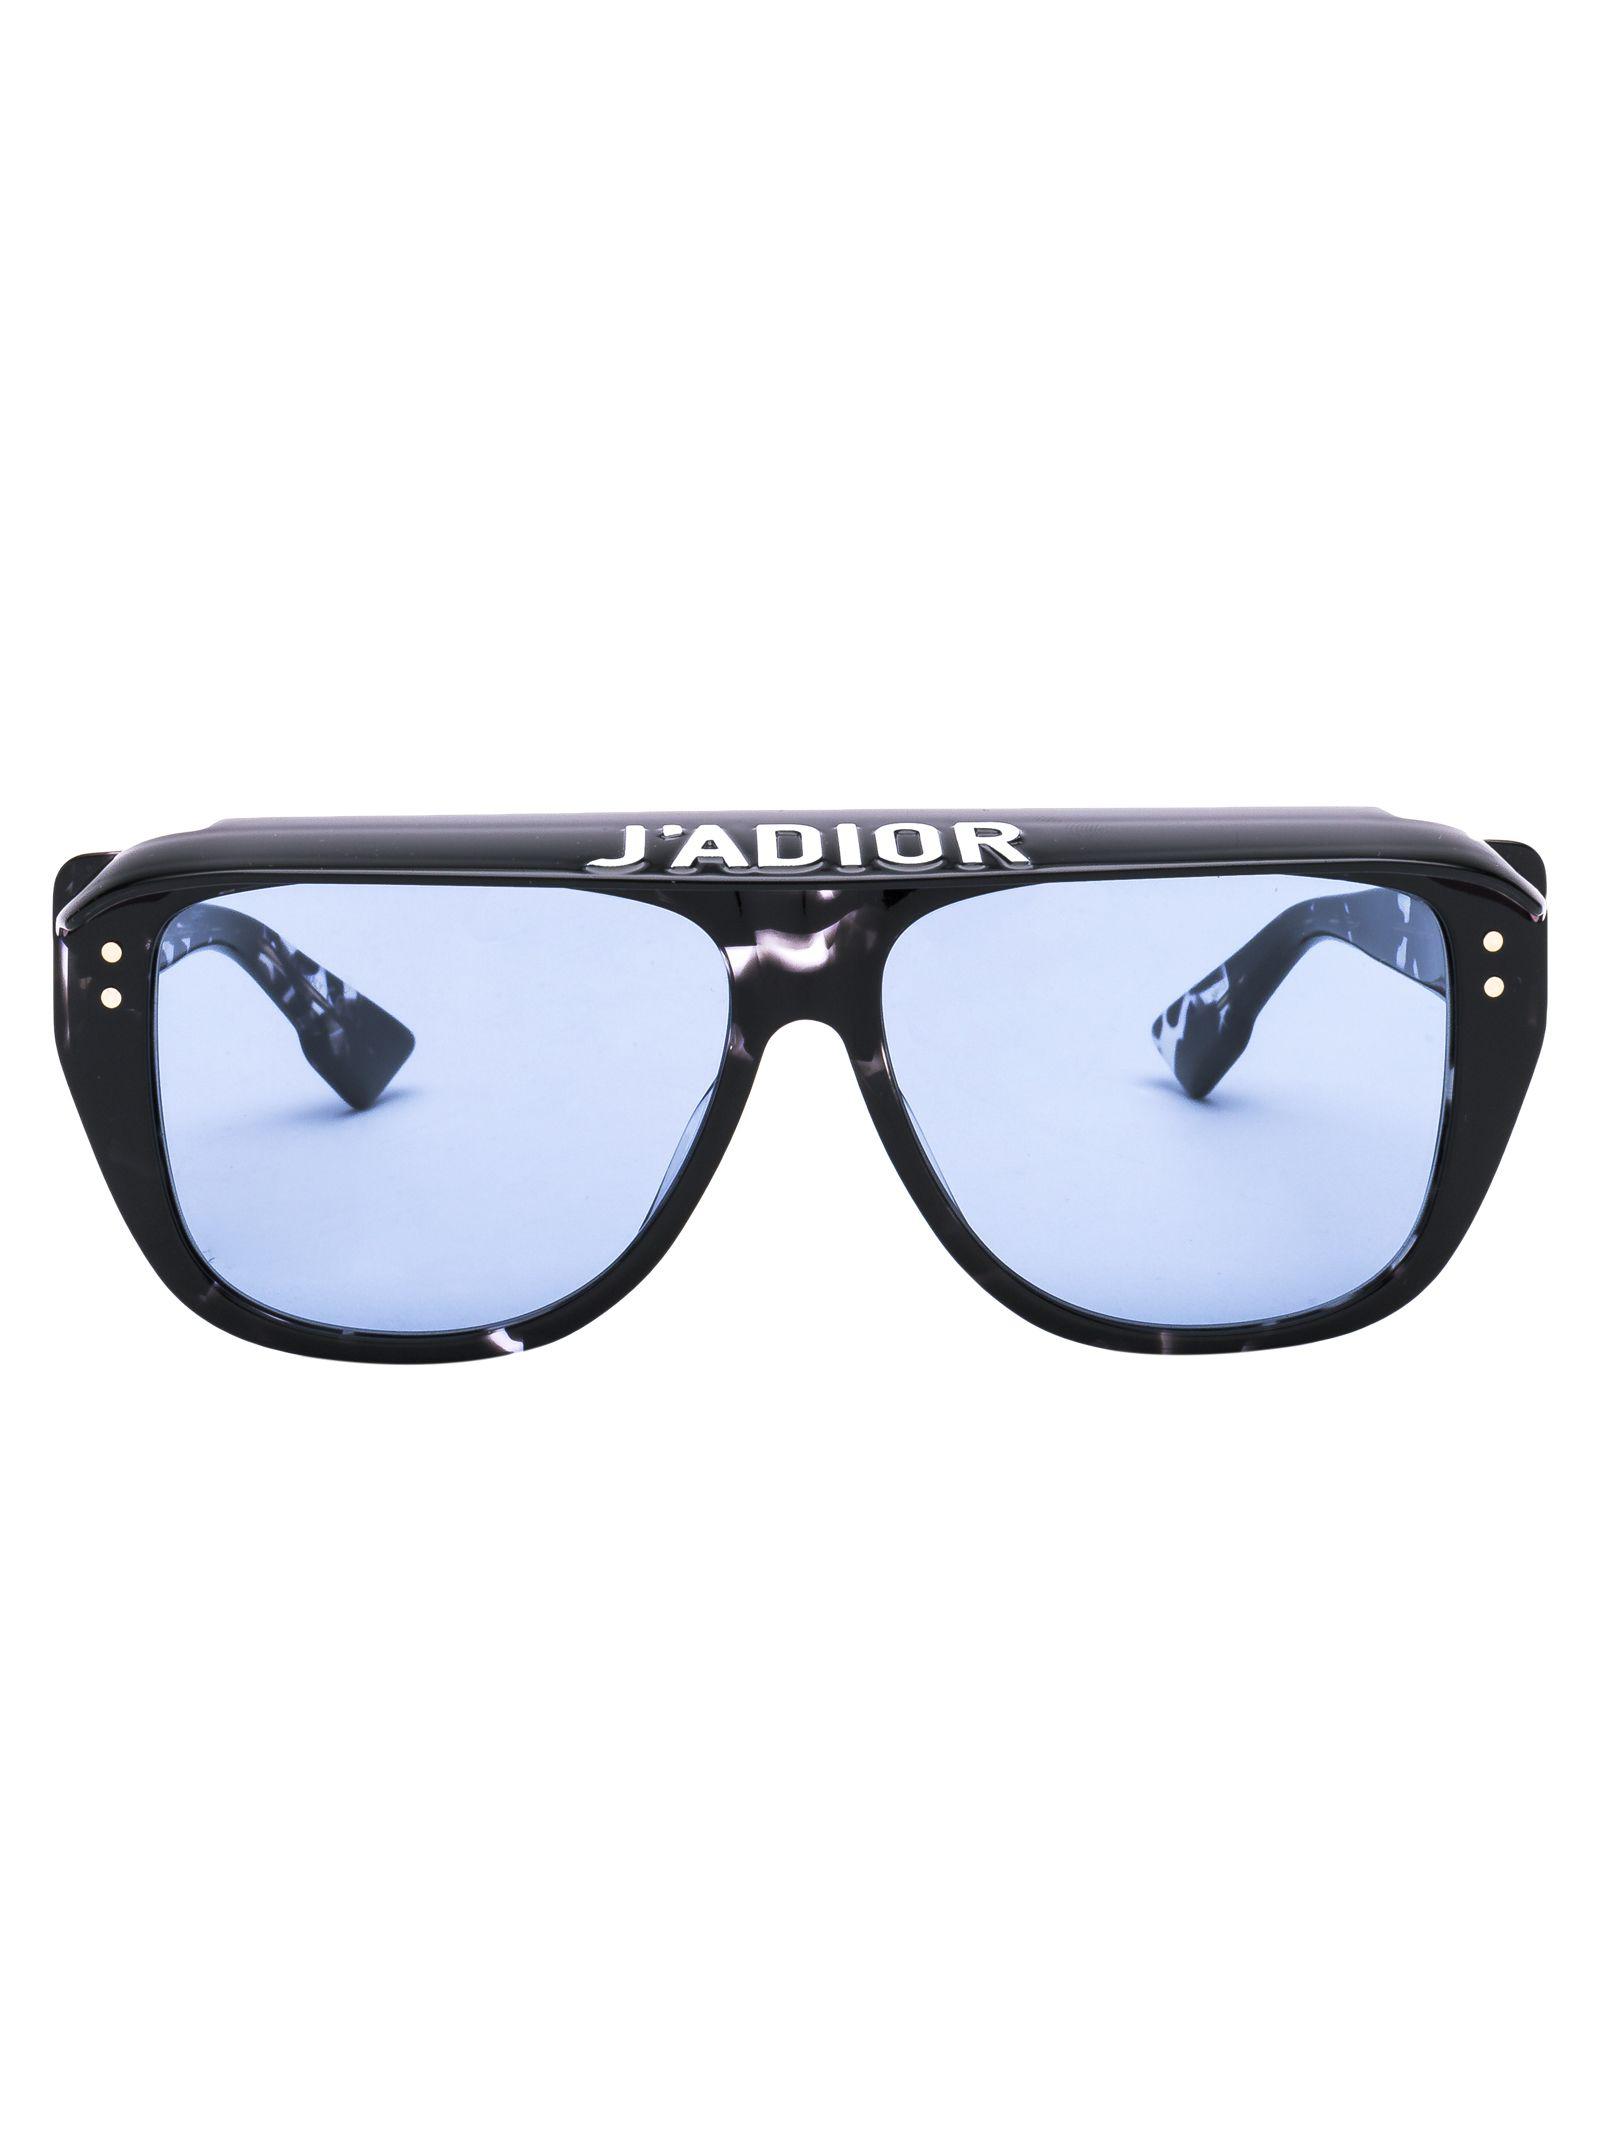 6aa6a3815b Dior Club 2 Sunglasses In 9Wzku